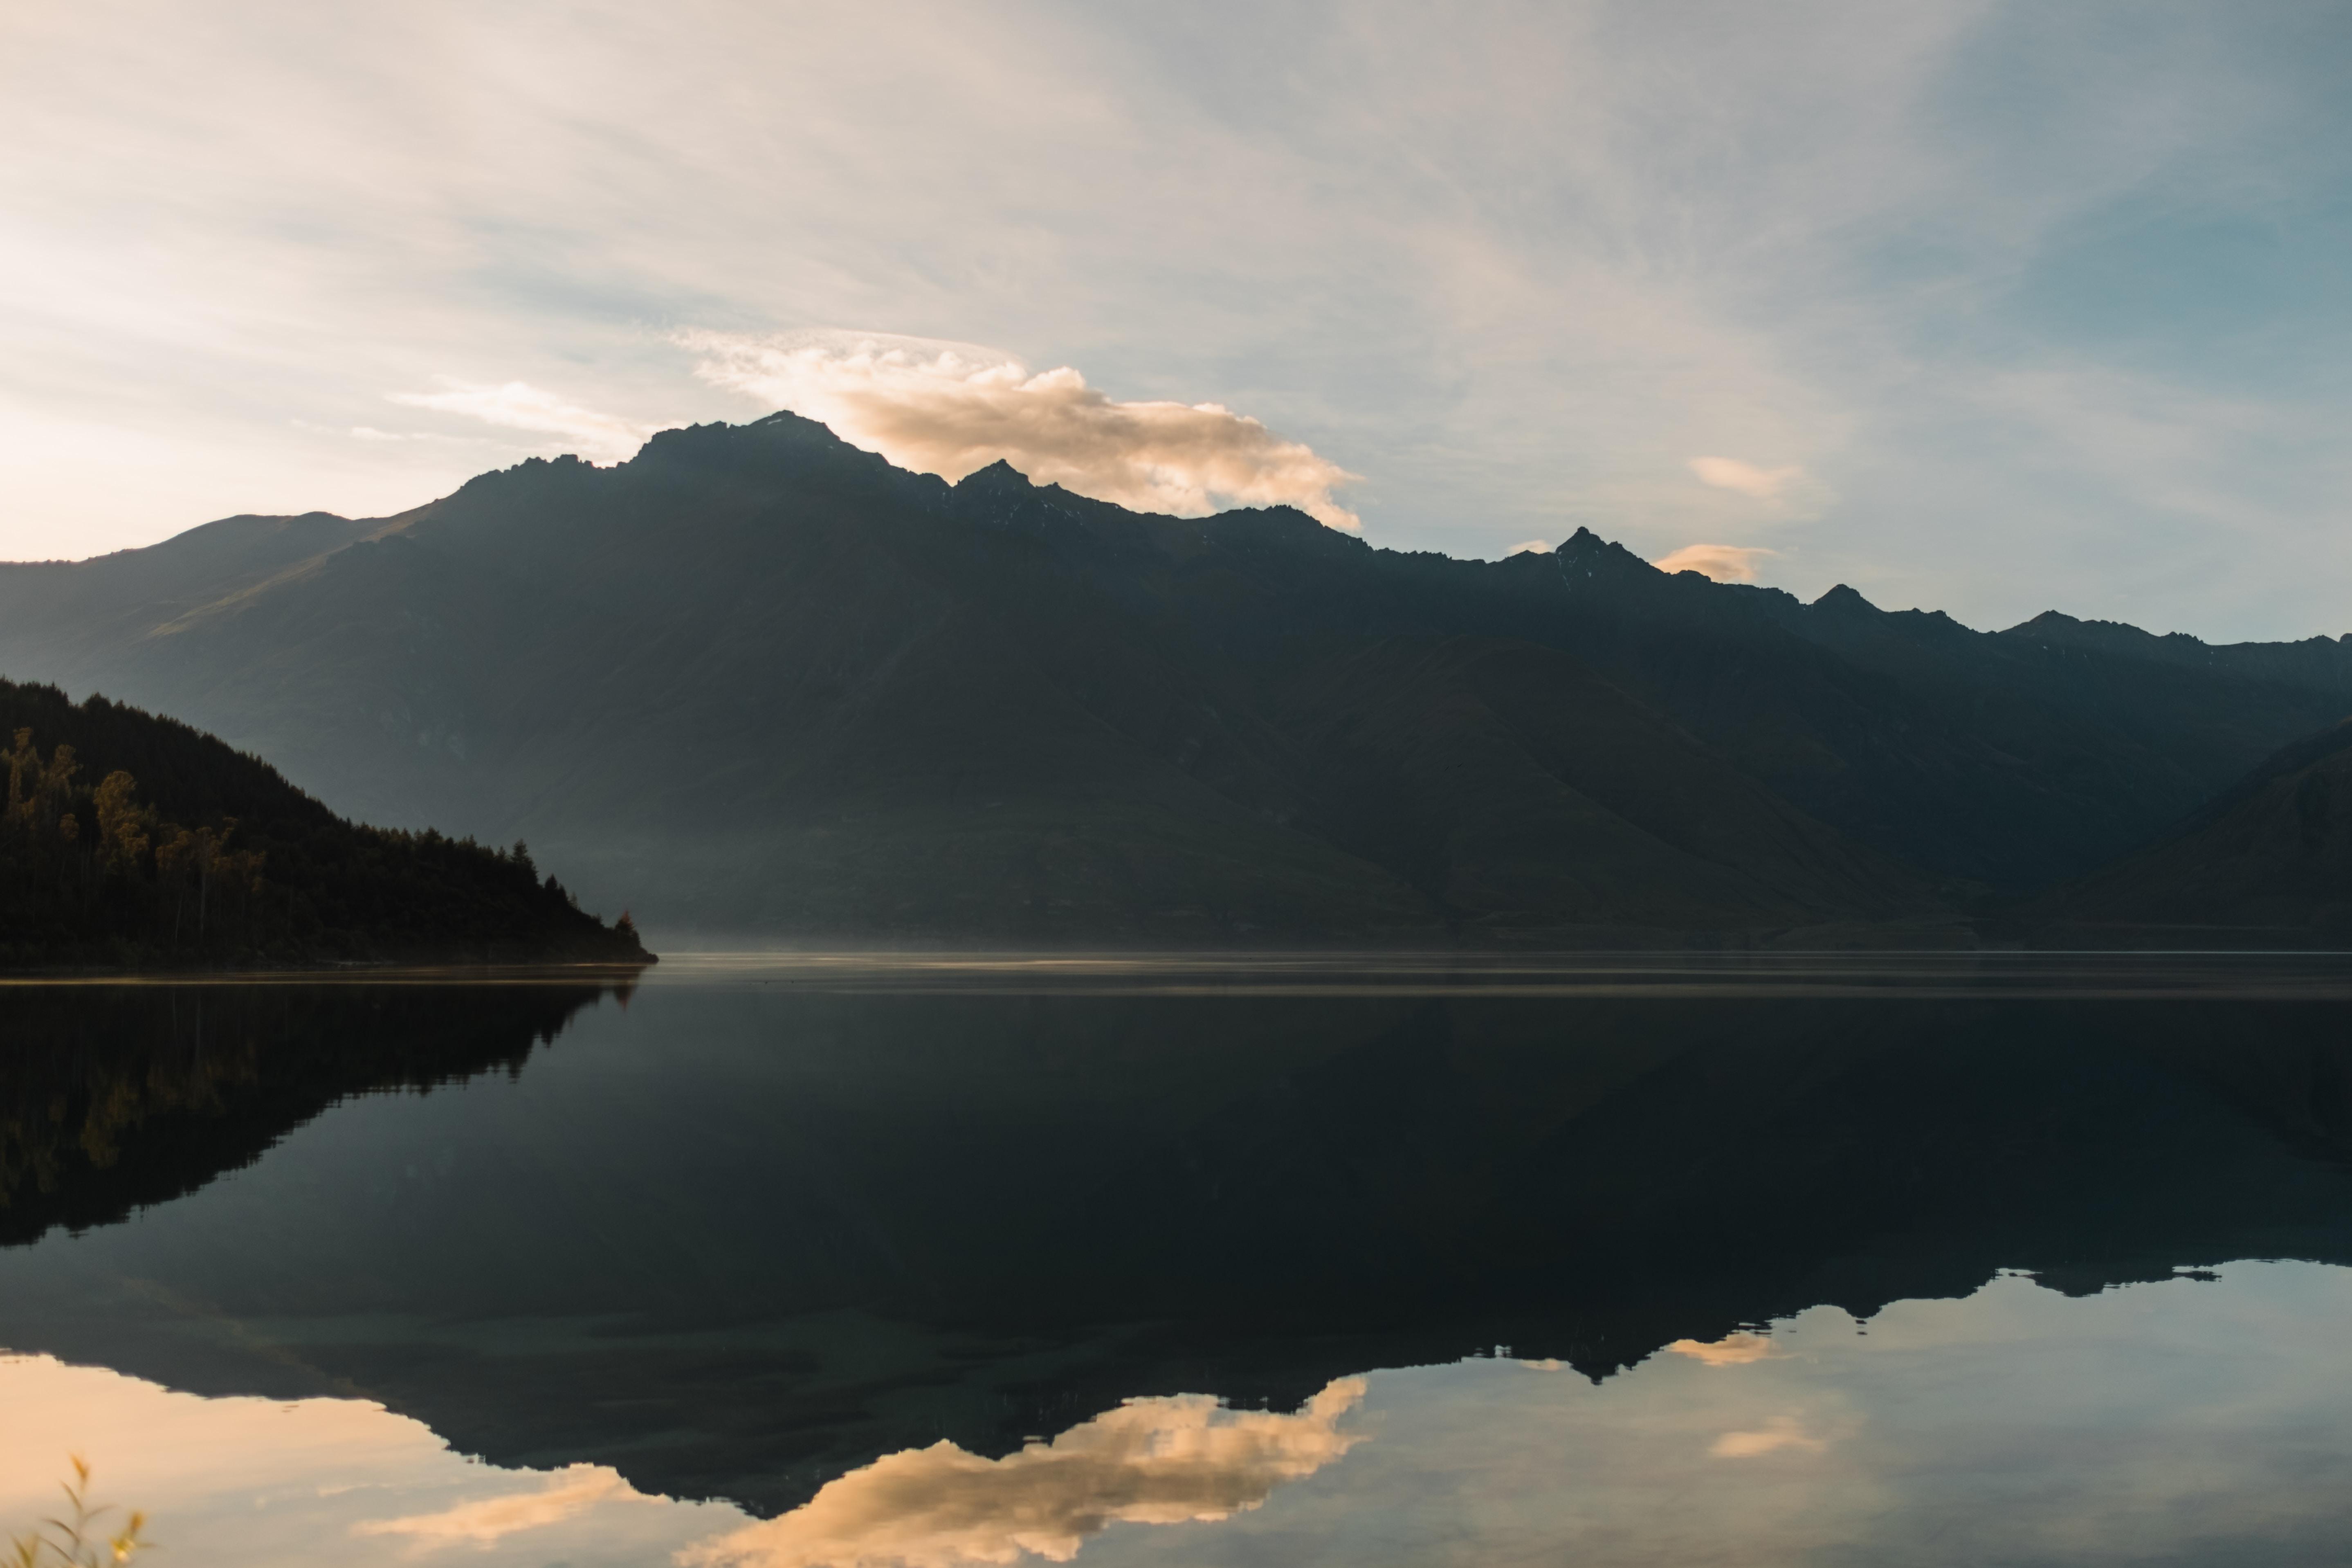 mountain across body of water